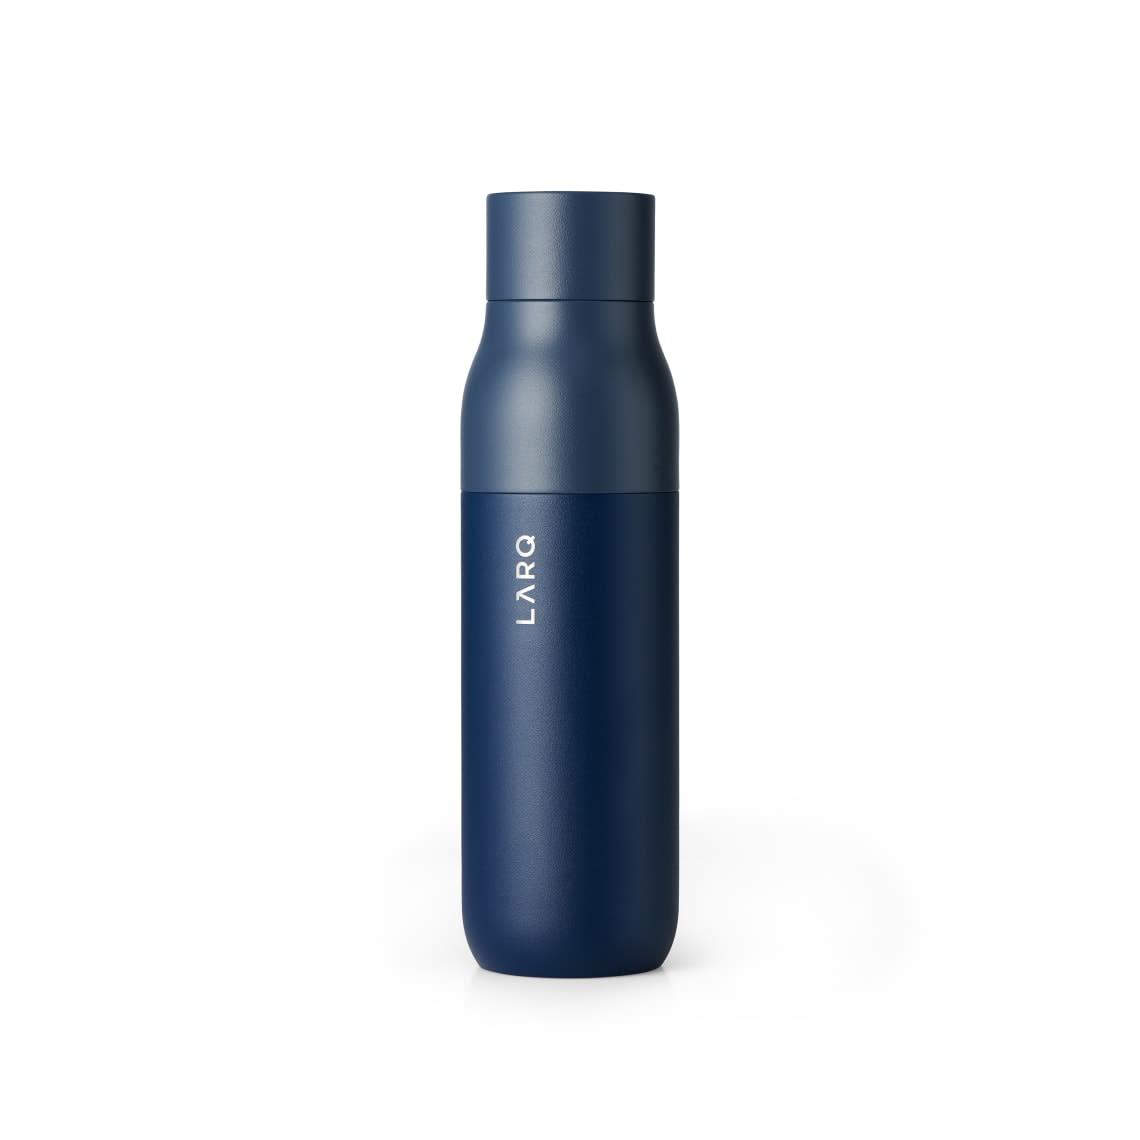 LARQ Insulated Bottle - Monaco Blue